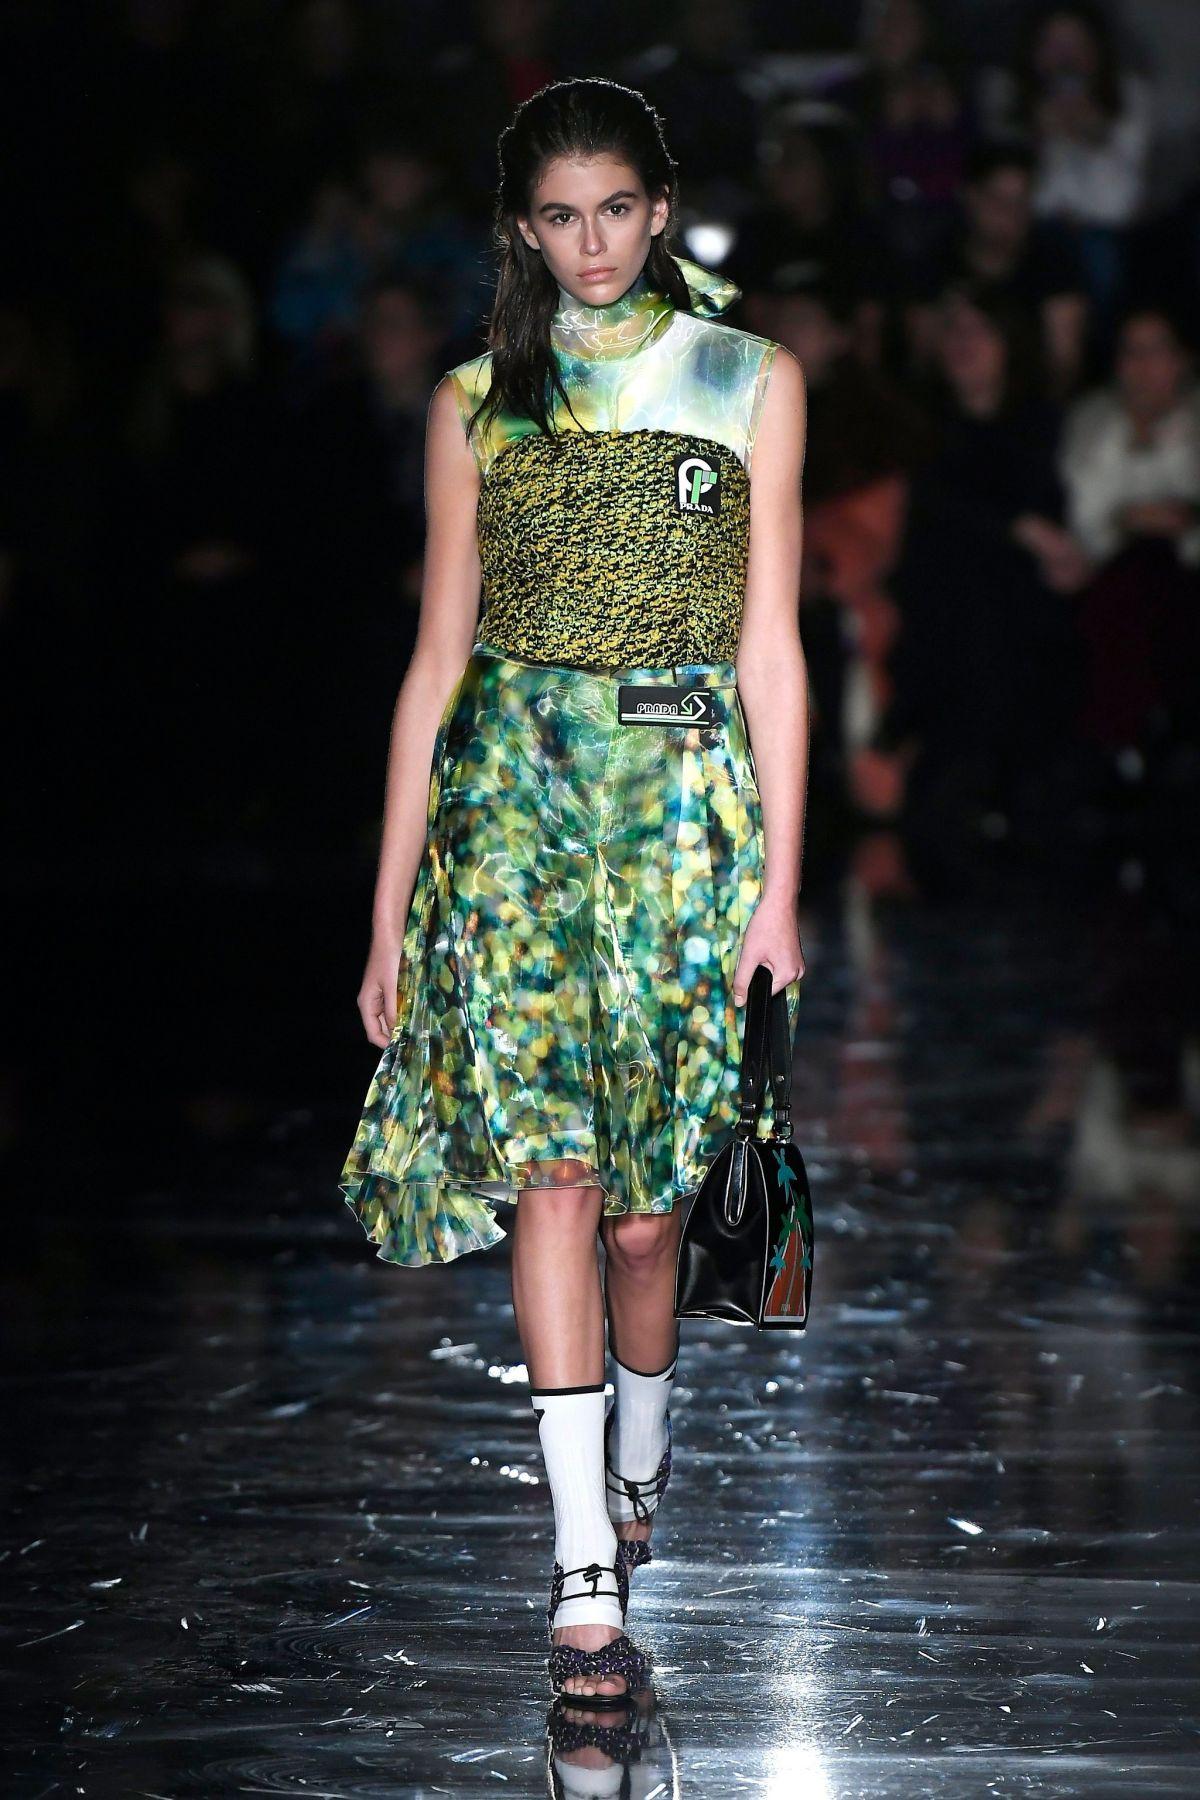 KAIA GERBER at Prada Show at Milan Fashion Week 02/22/2018 ...